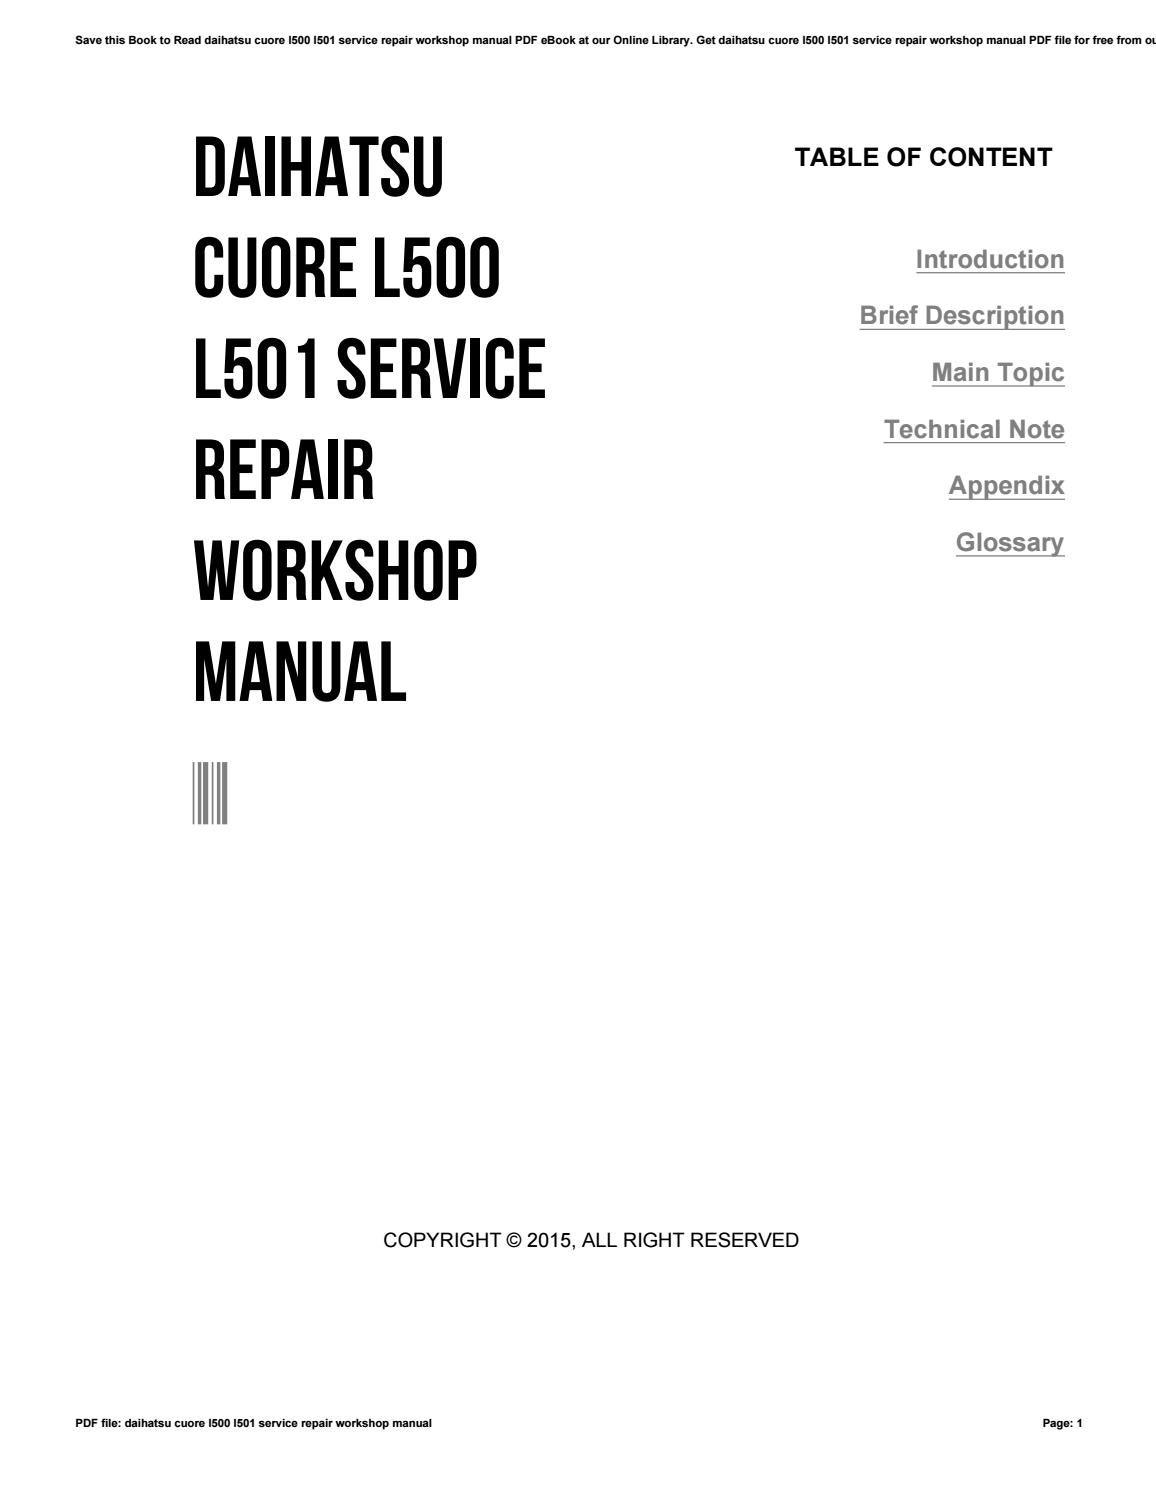 daihatsu cuore service manual free pdf